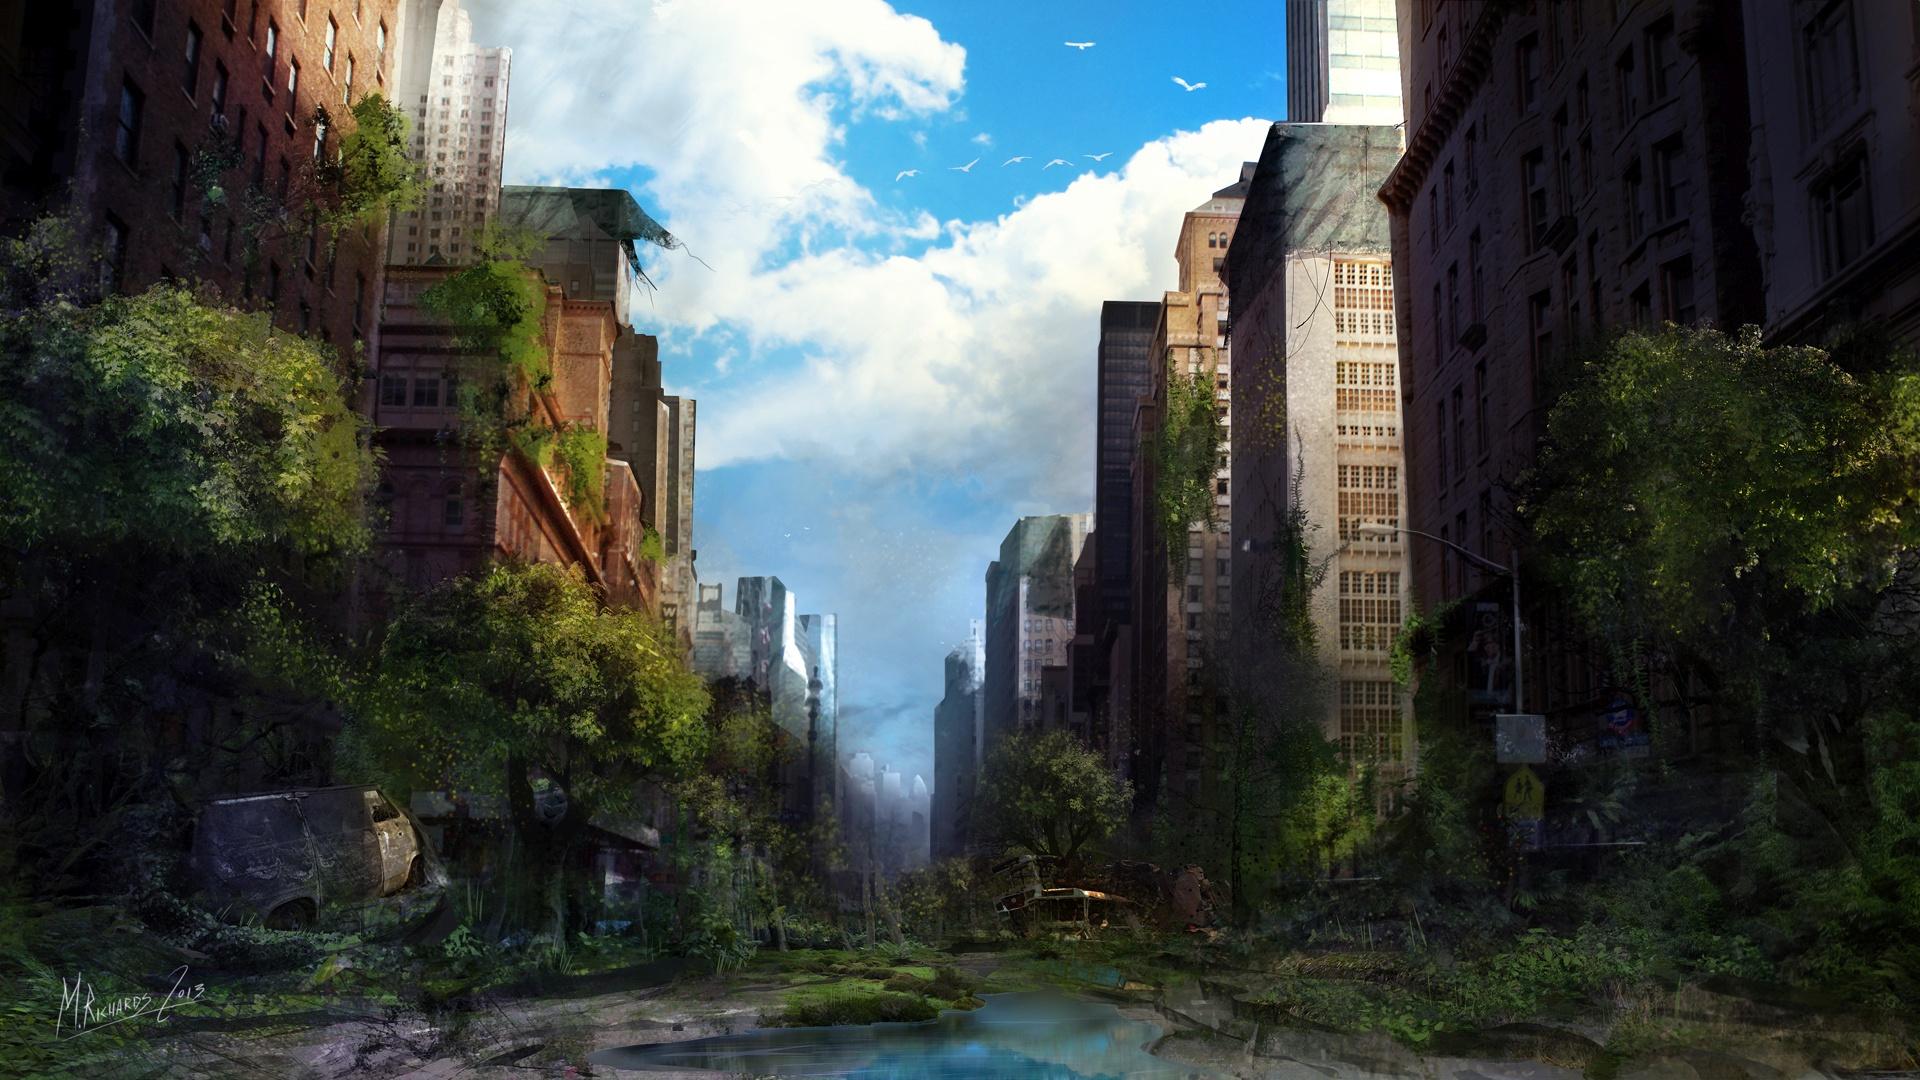 Post Apocalyptic Overgrown City 1080p wallpaper